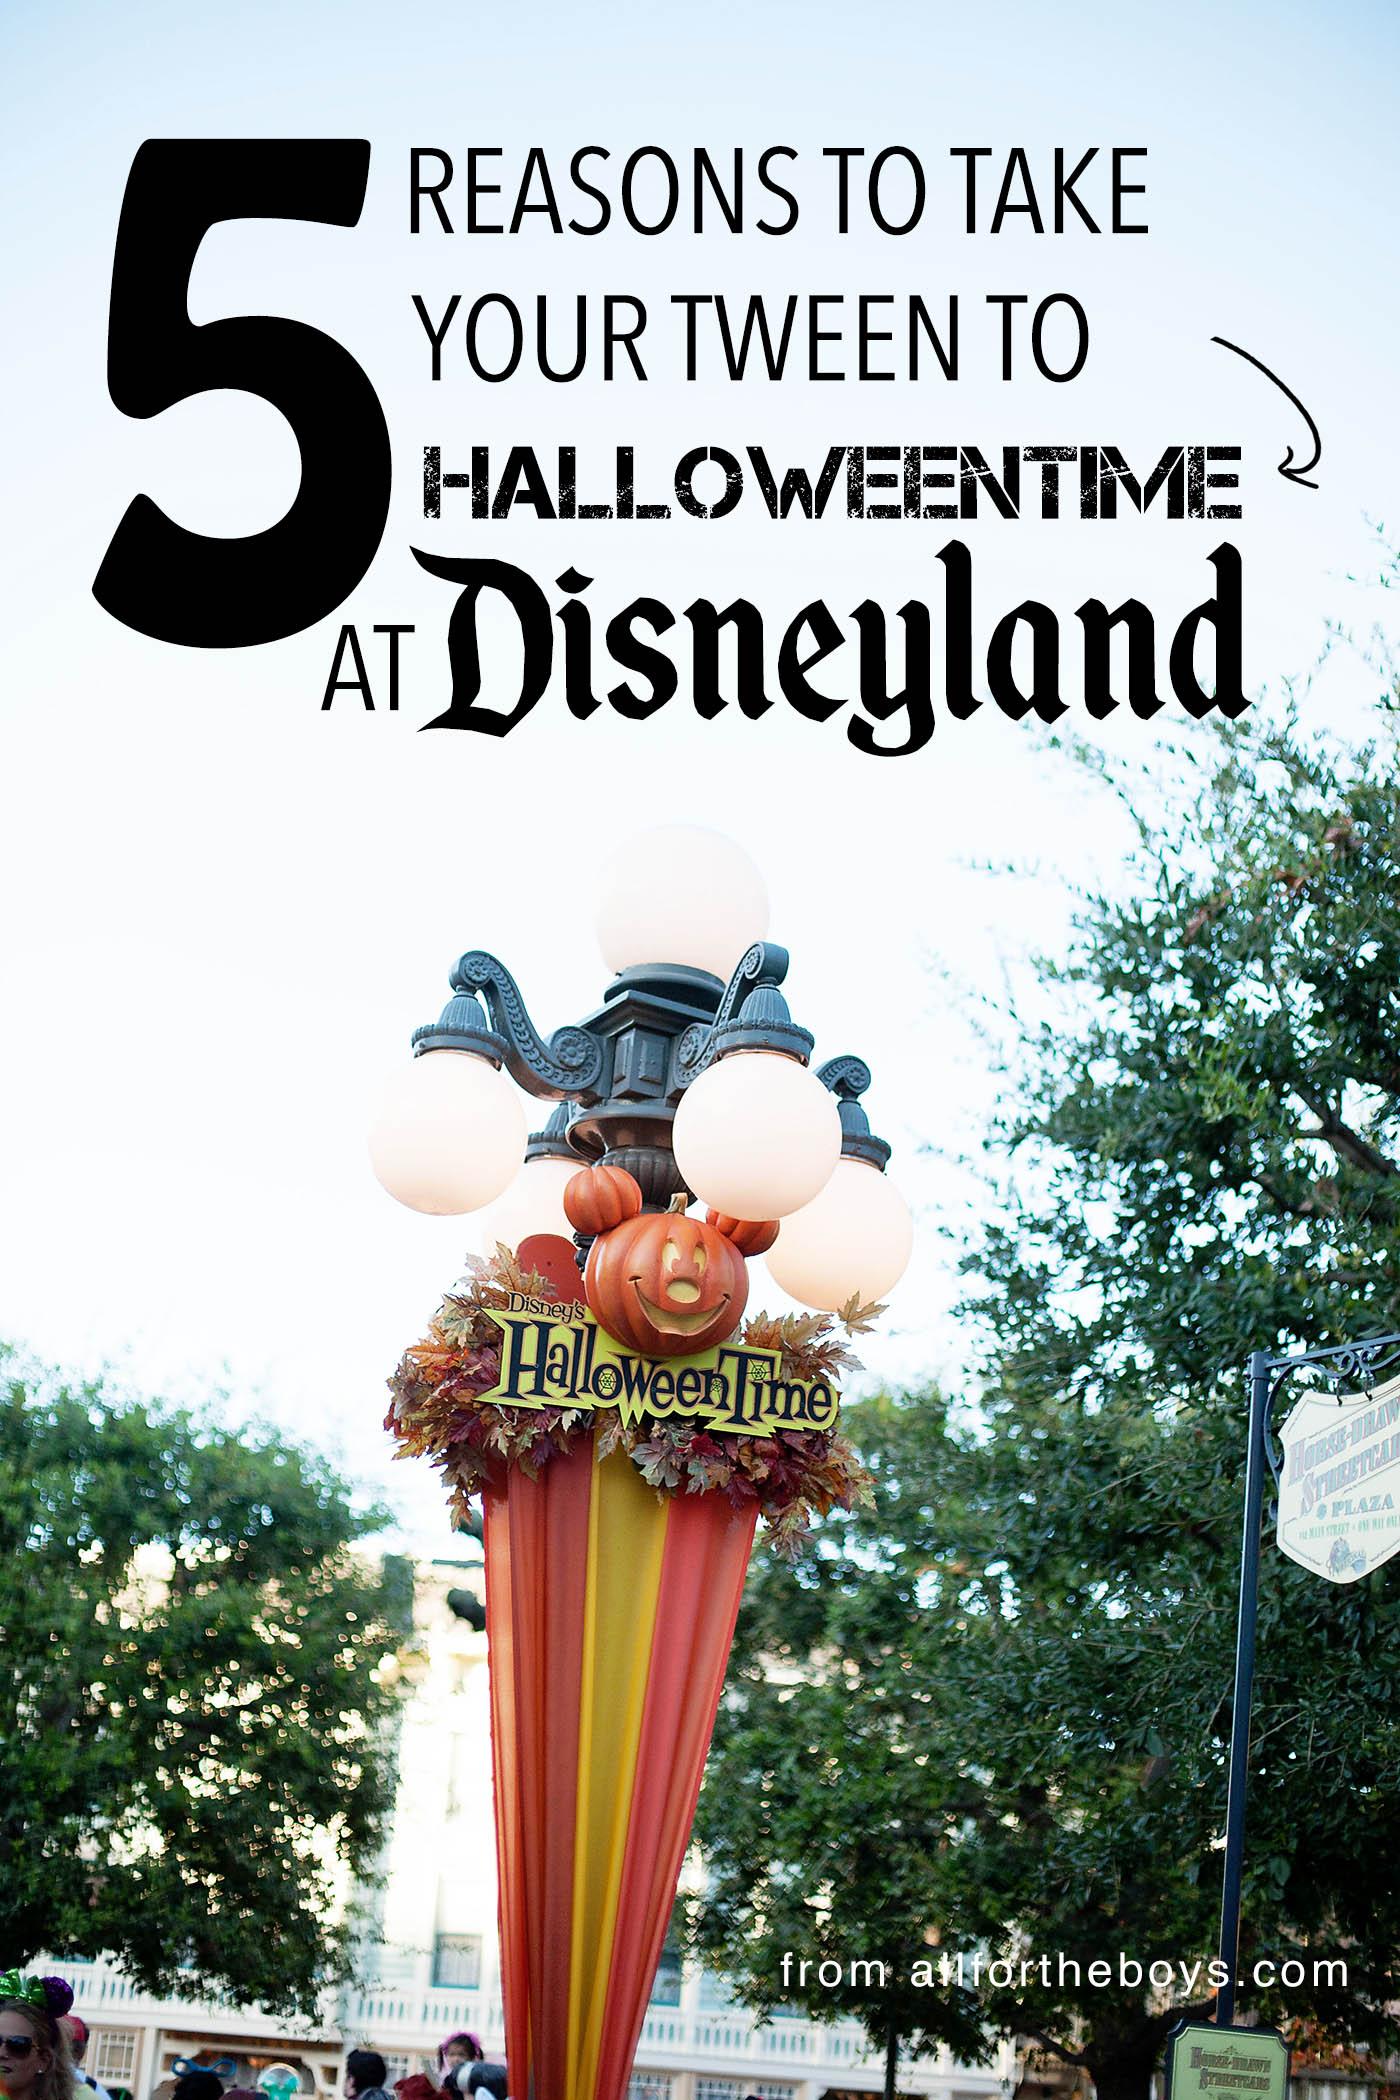 5 reasons to take your tween to HalloweenTime at Disneyland